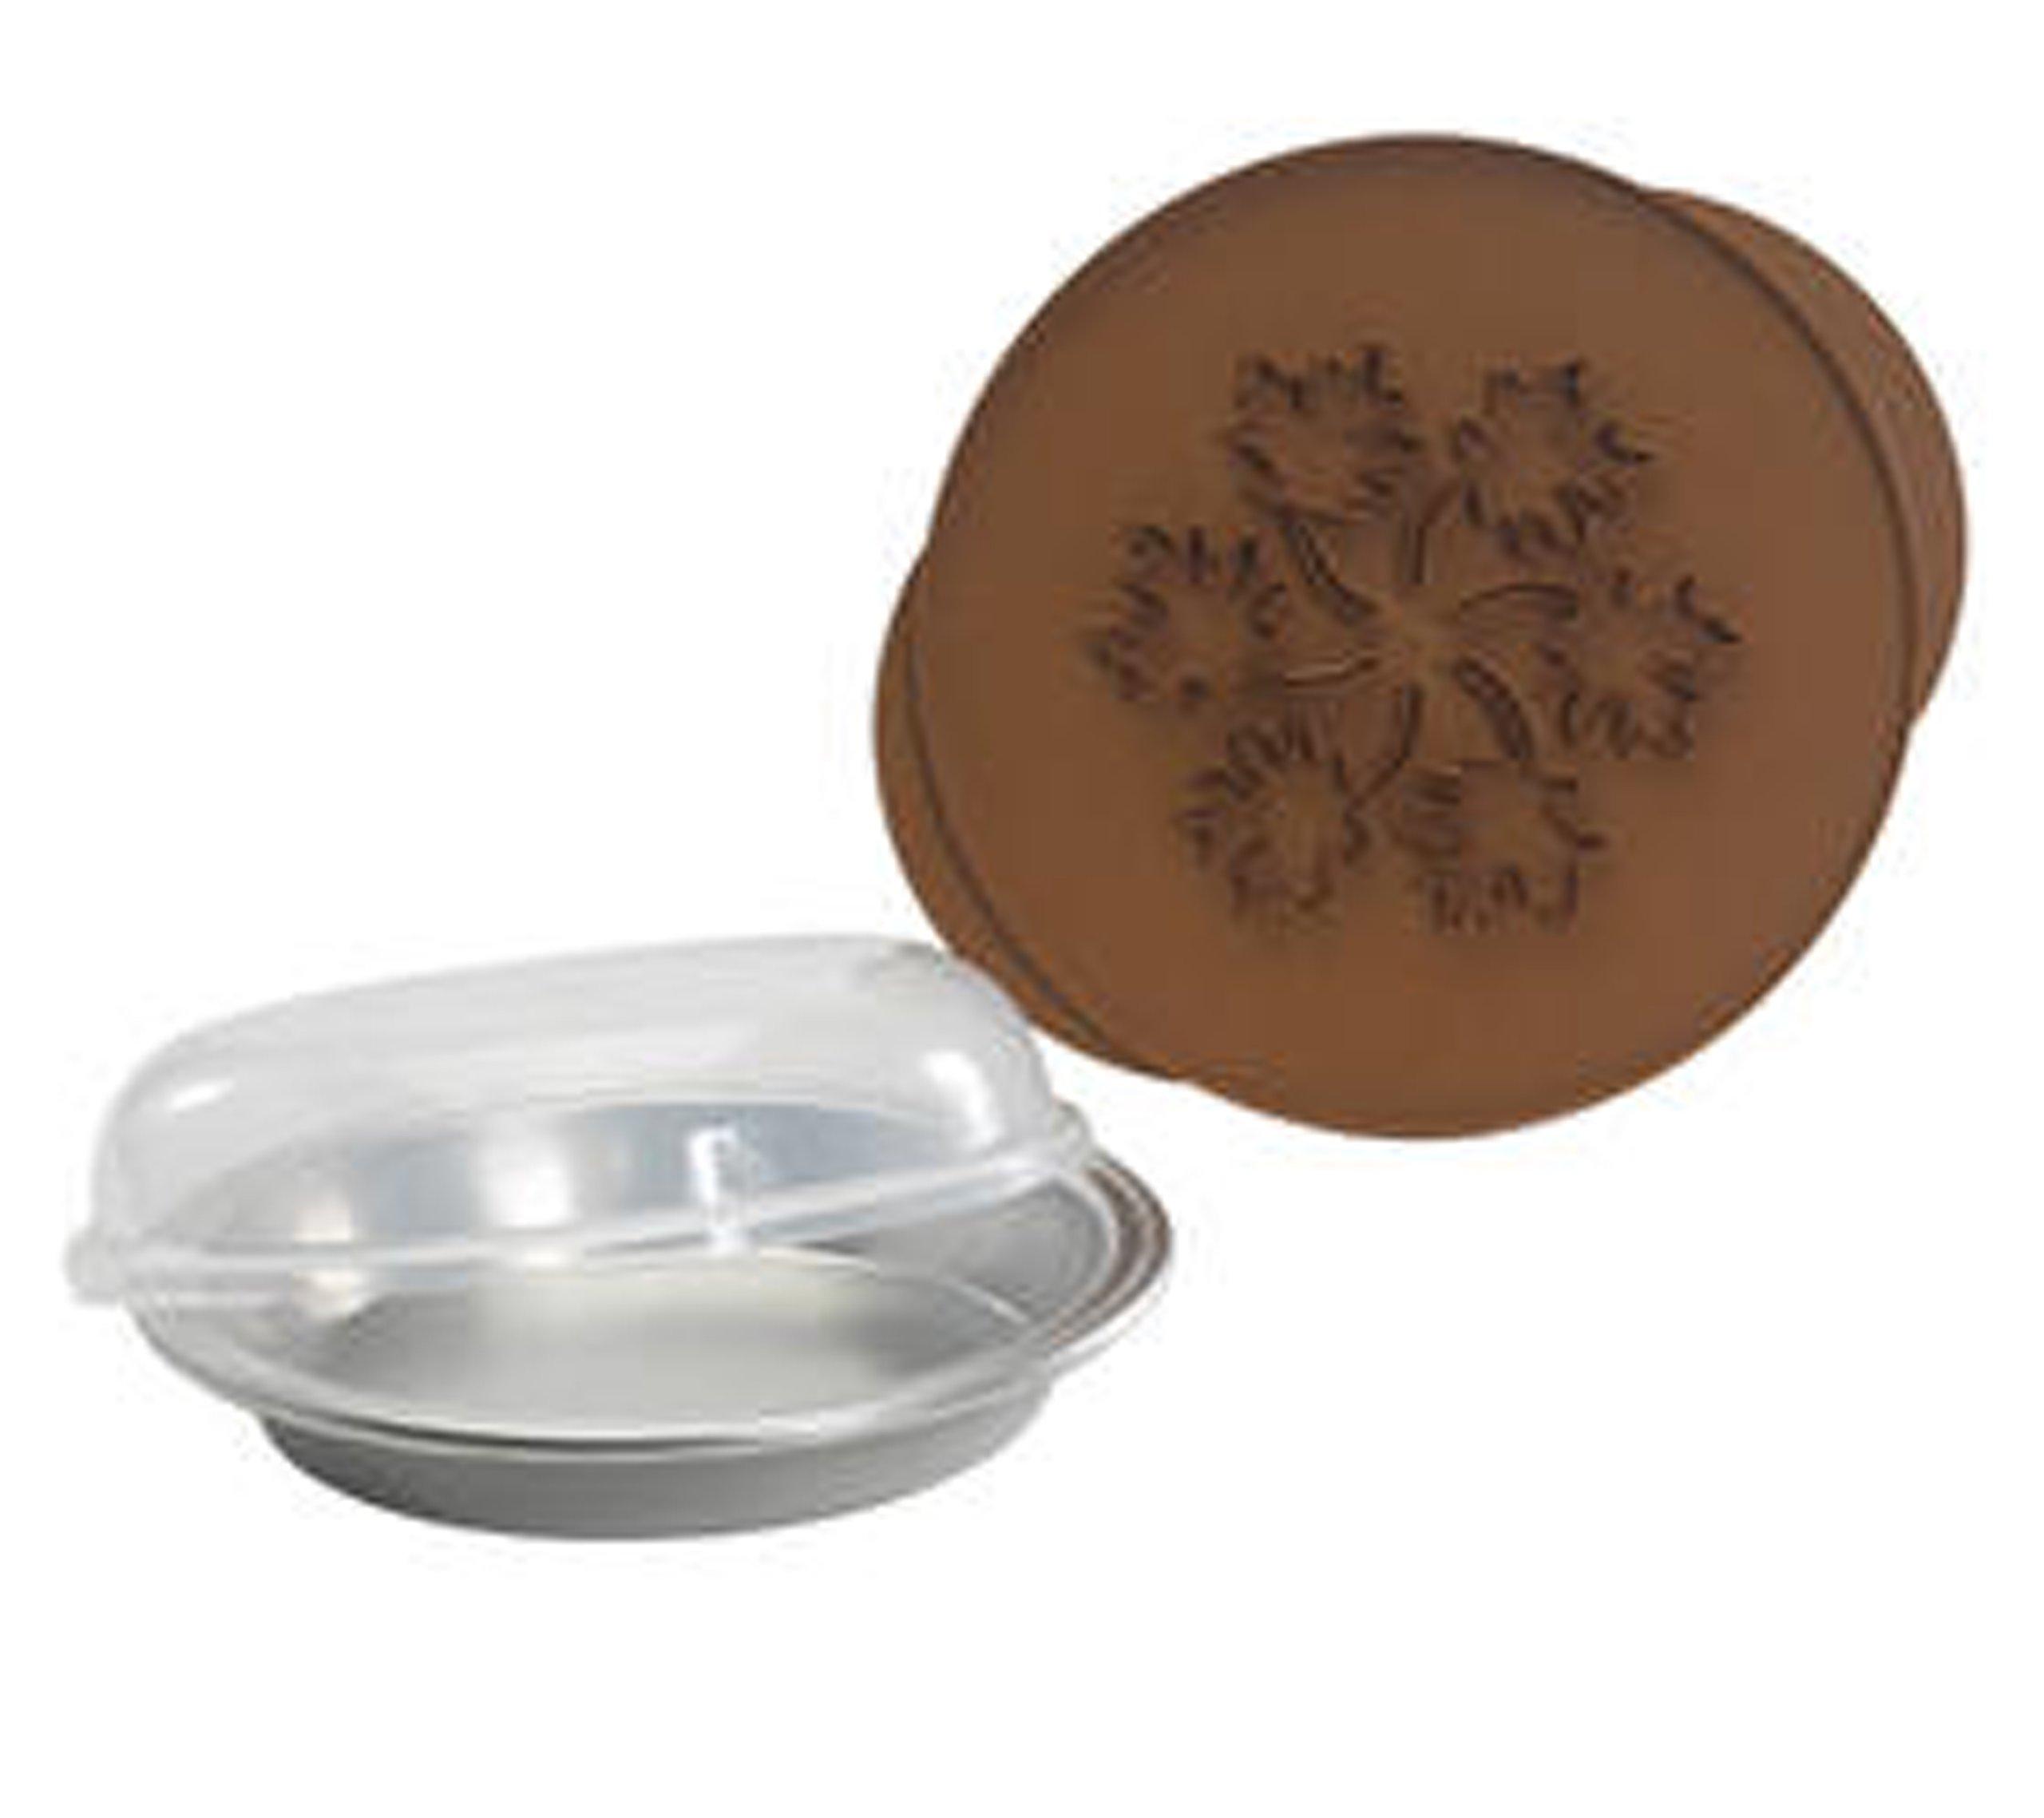 Nordic Ware Pie Bakers Kit